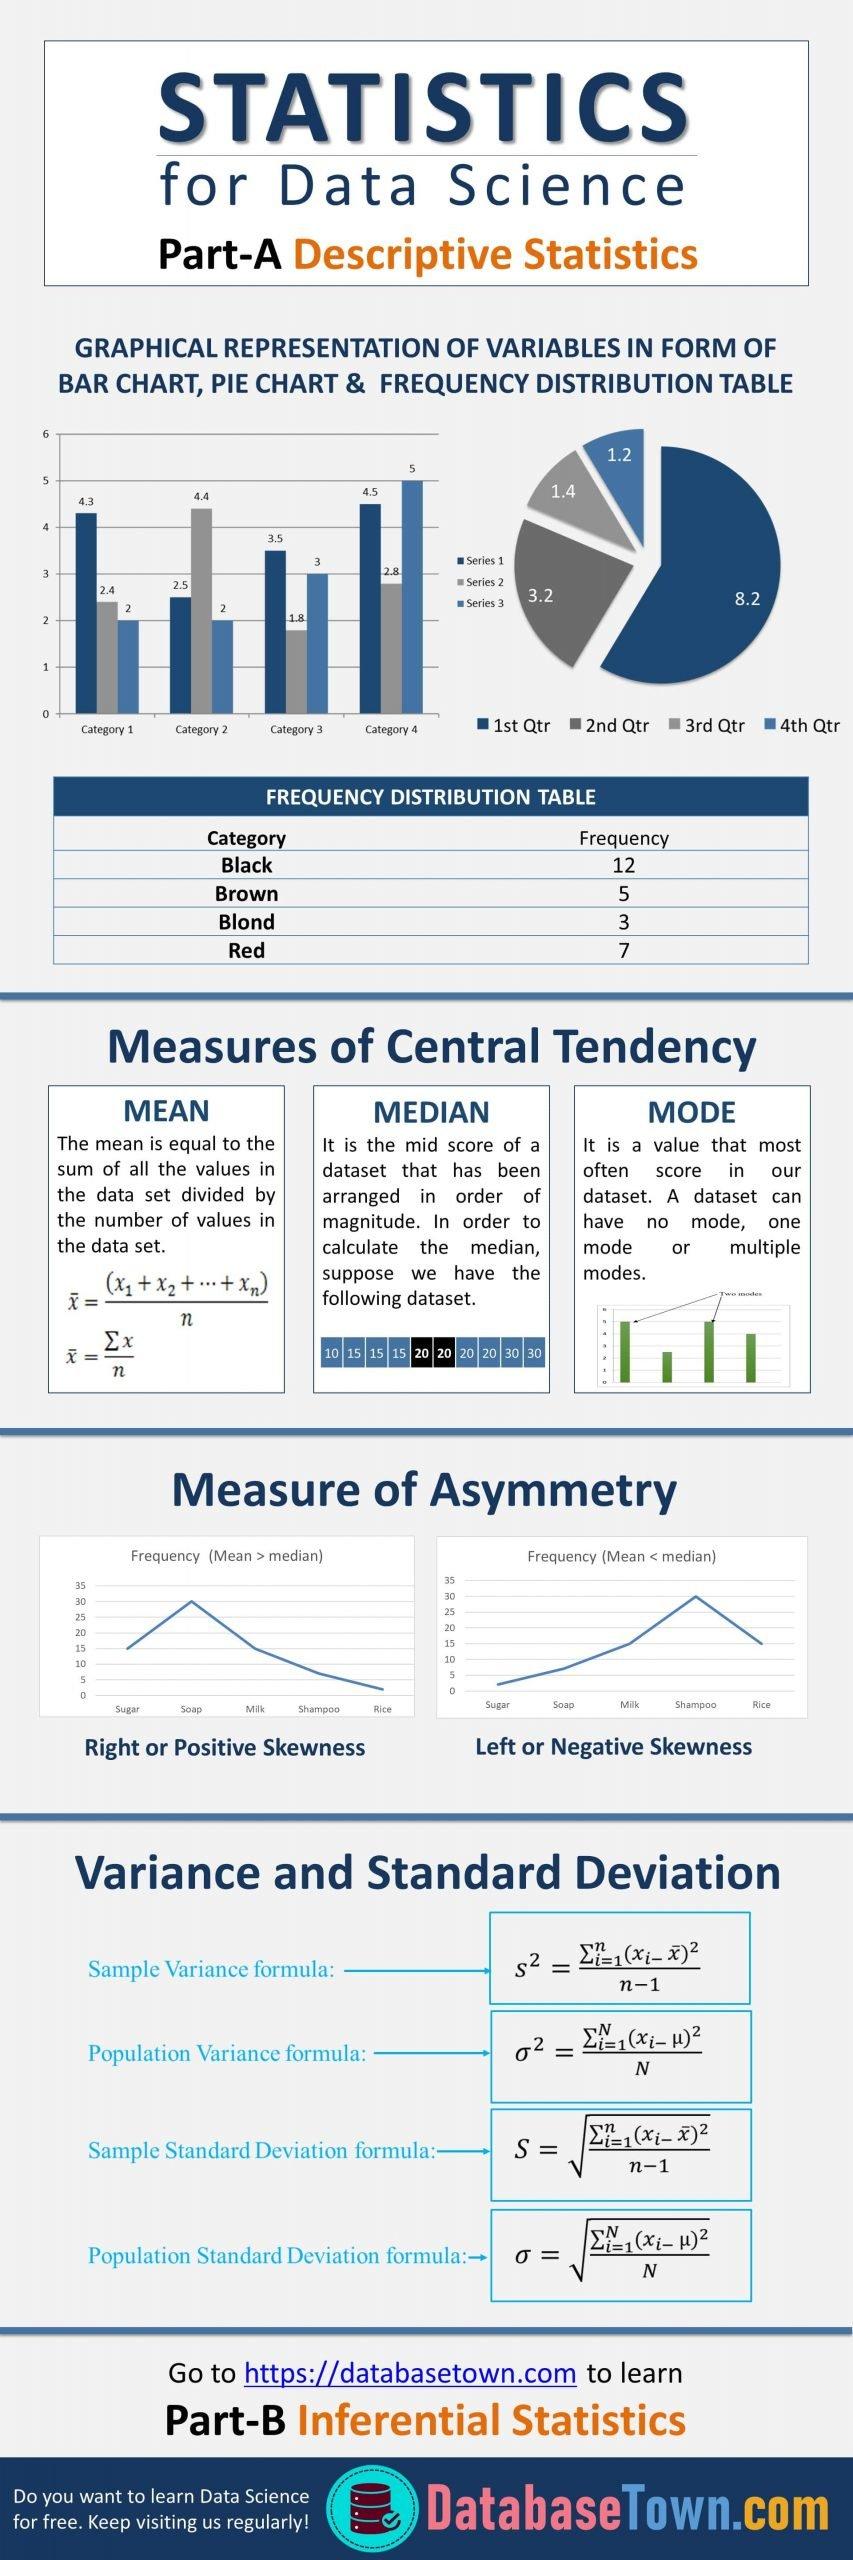 Statistics for Data Science (Descriptive Statistics)